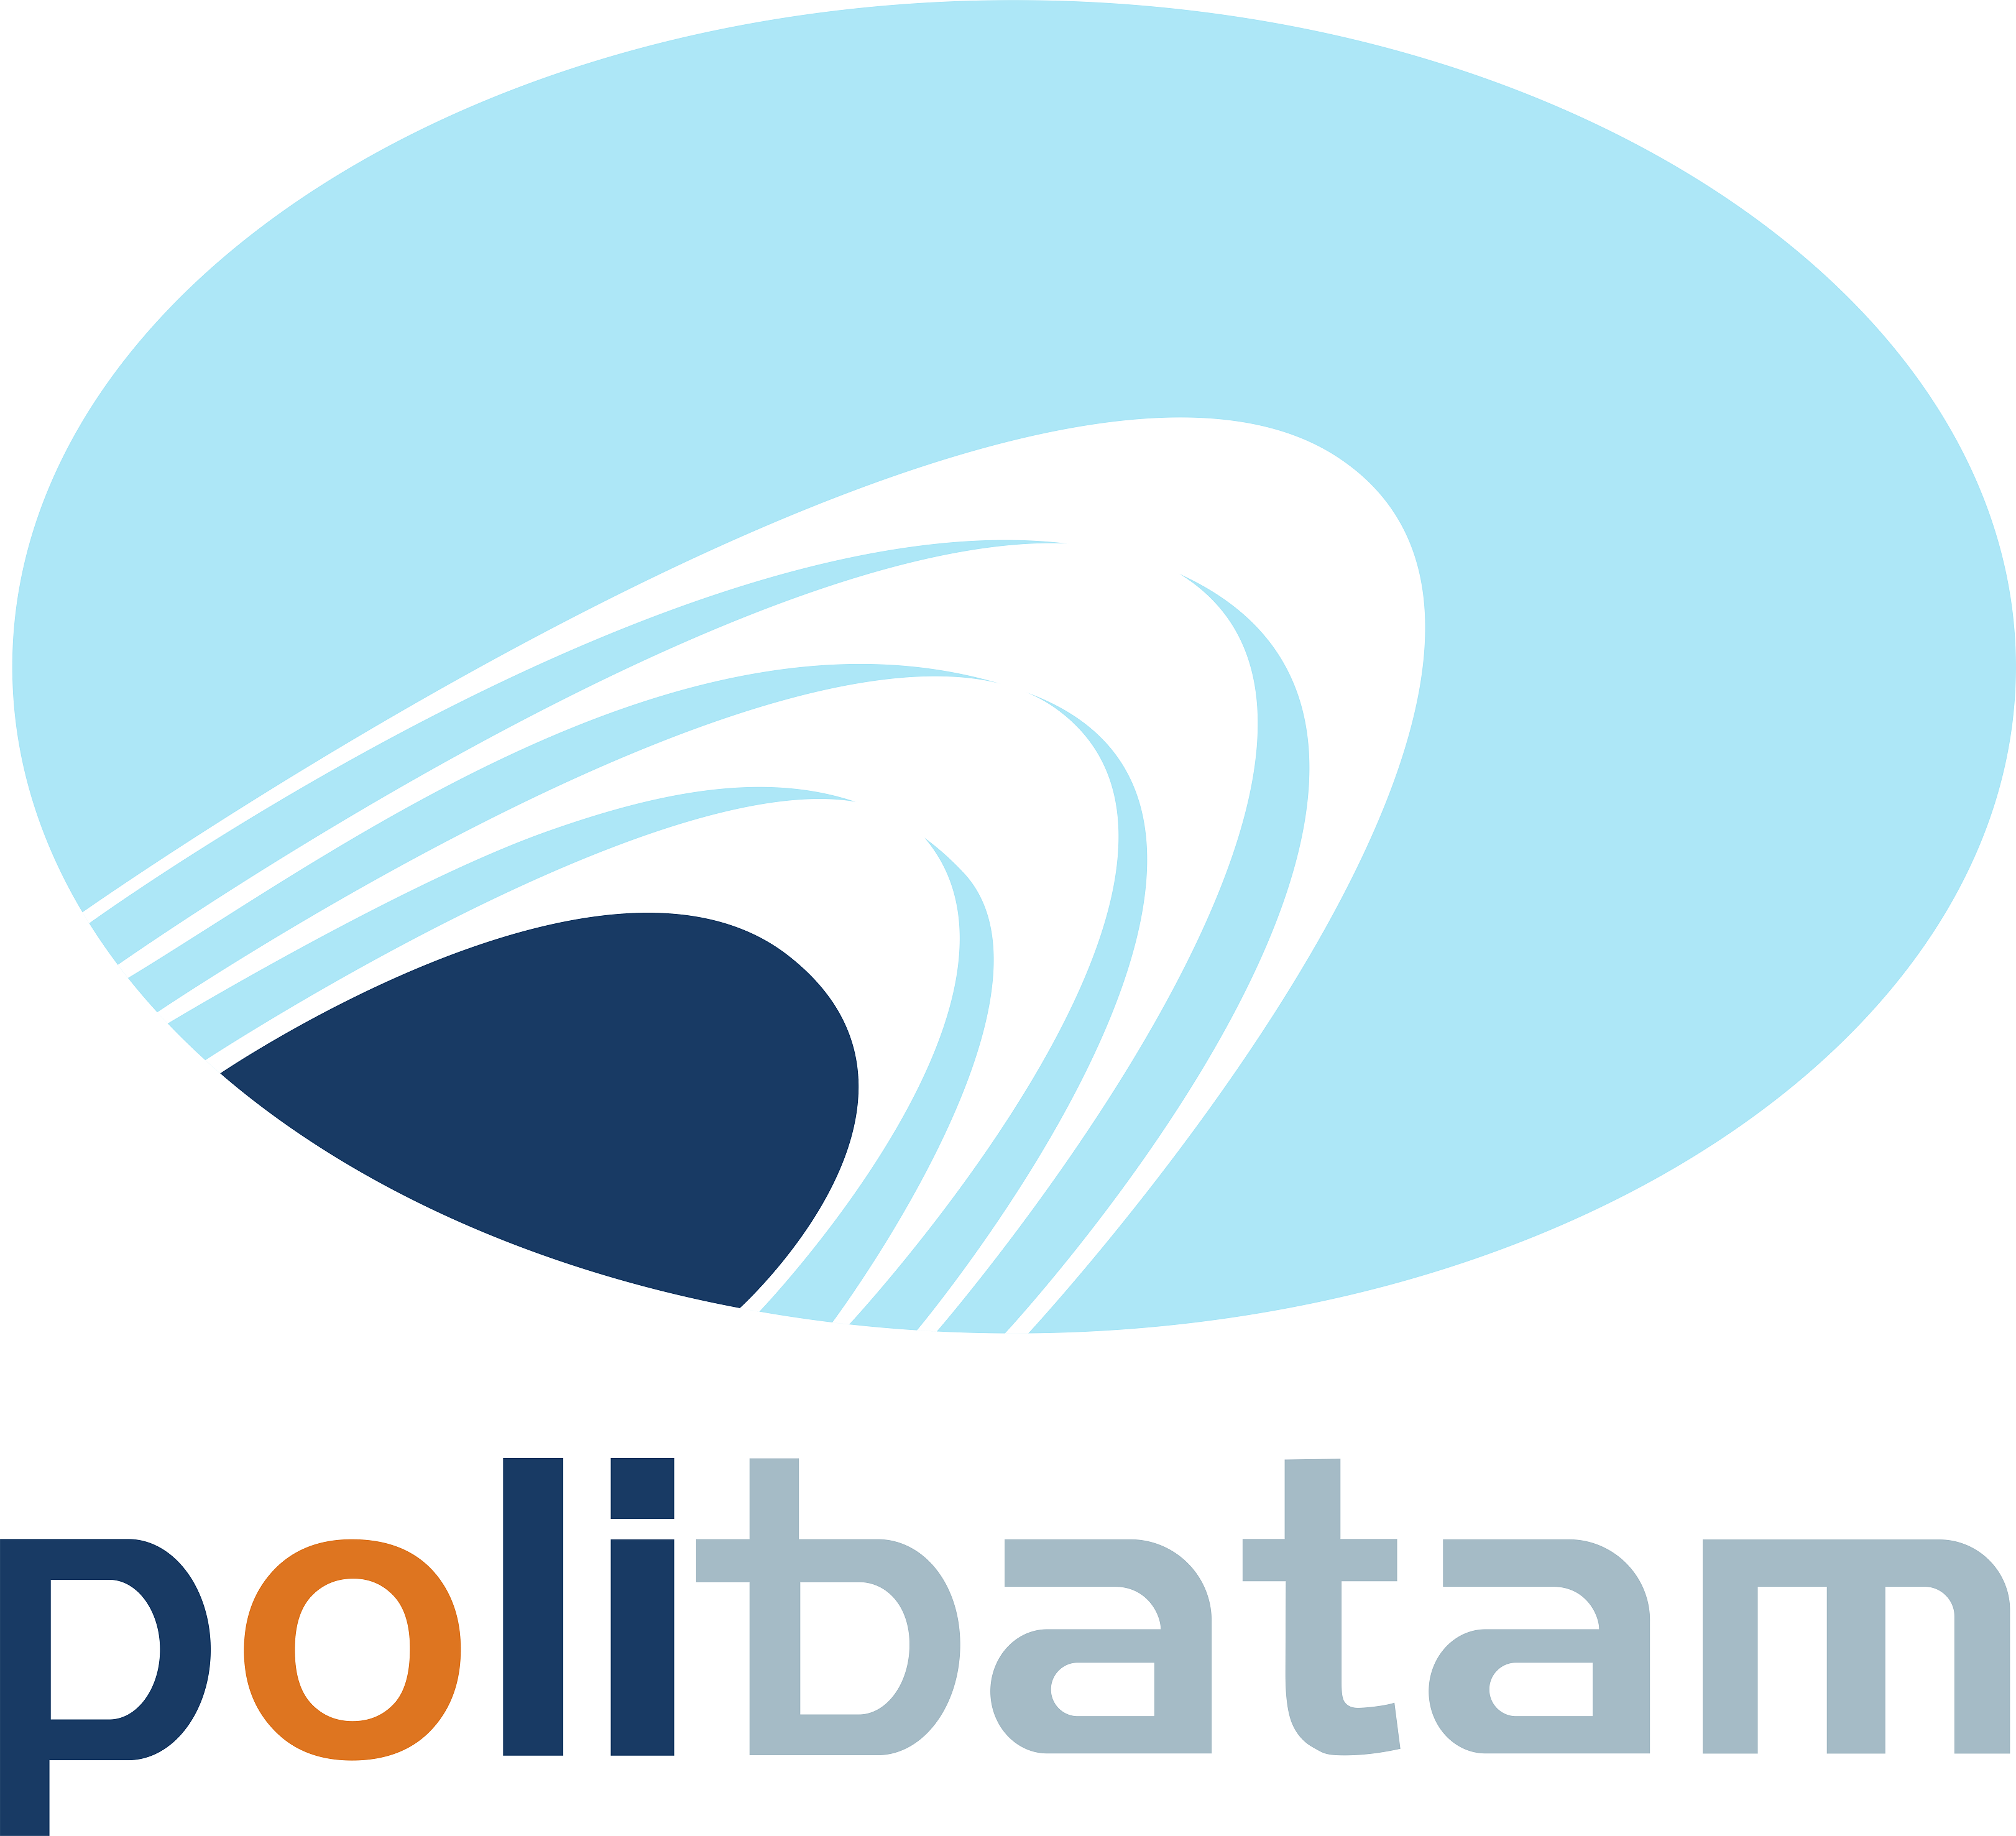 logo POLIBATAM